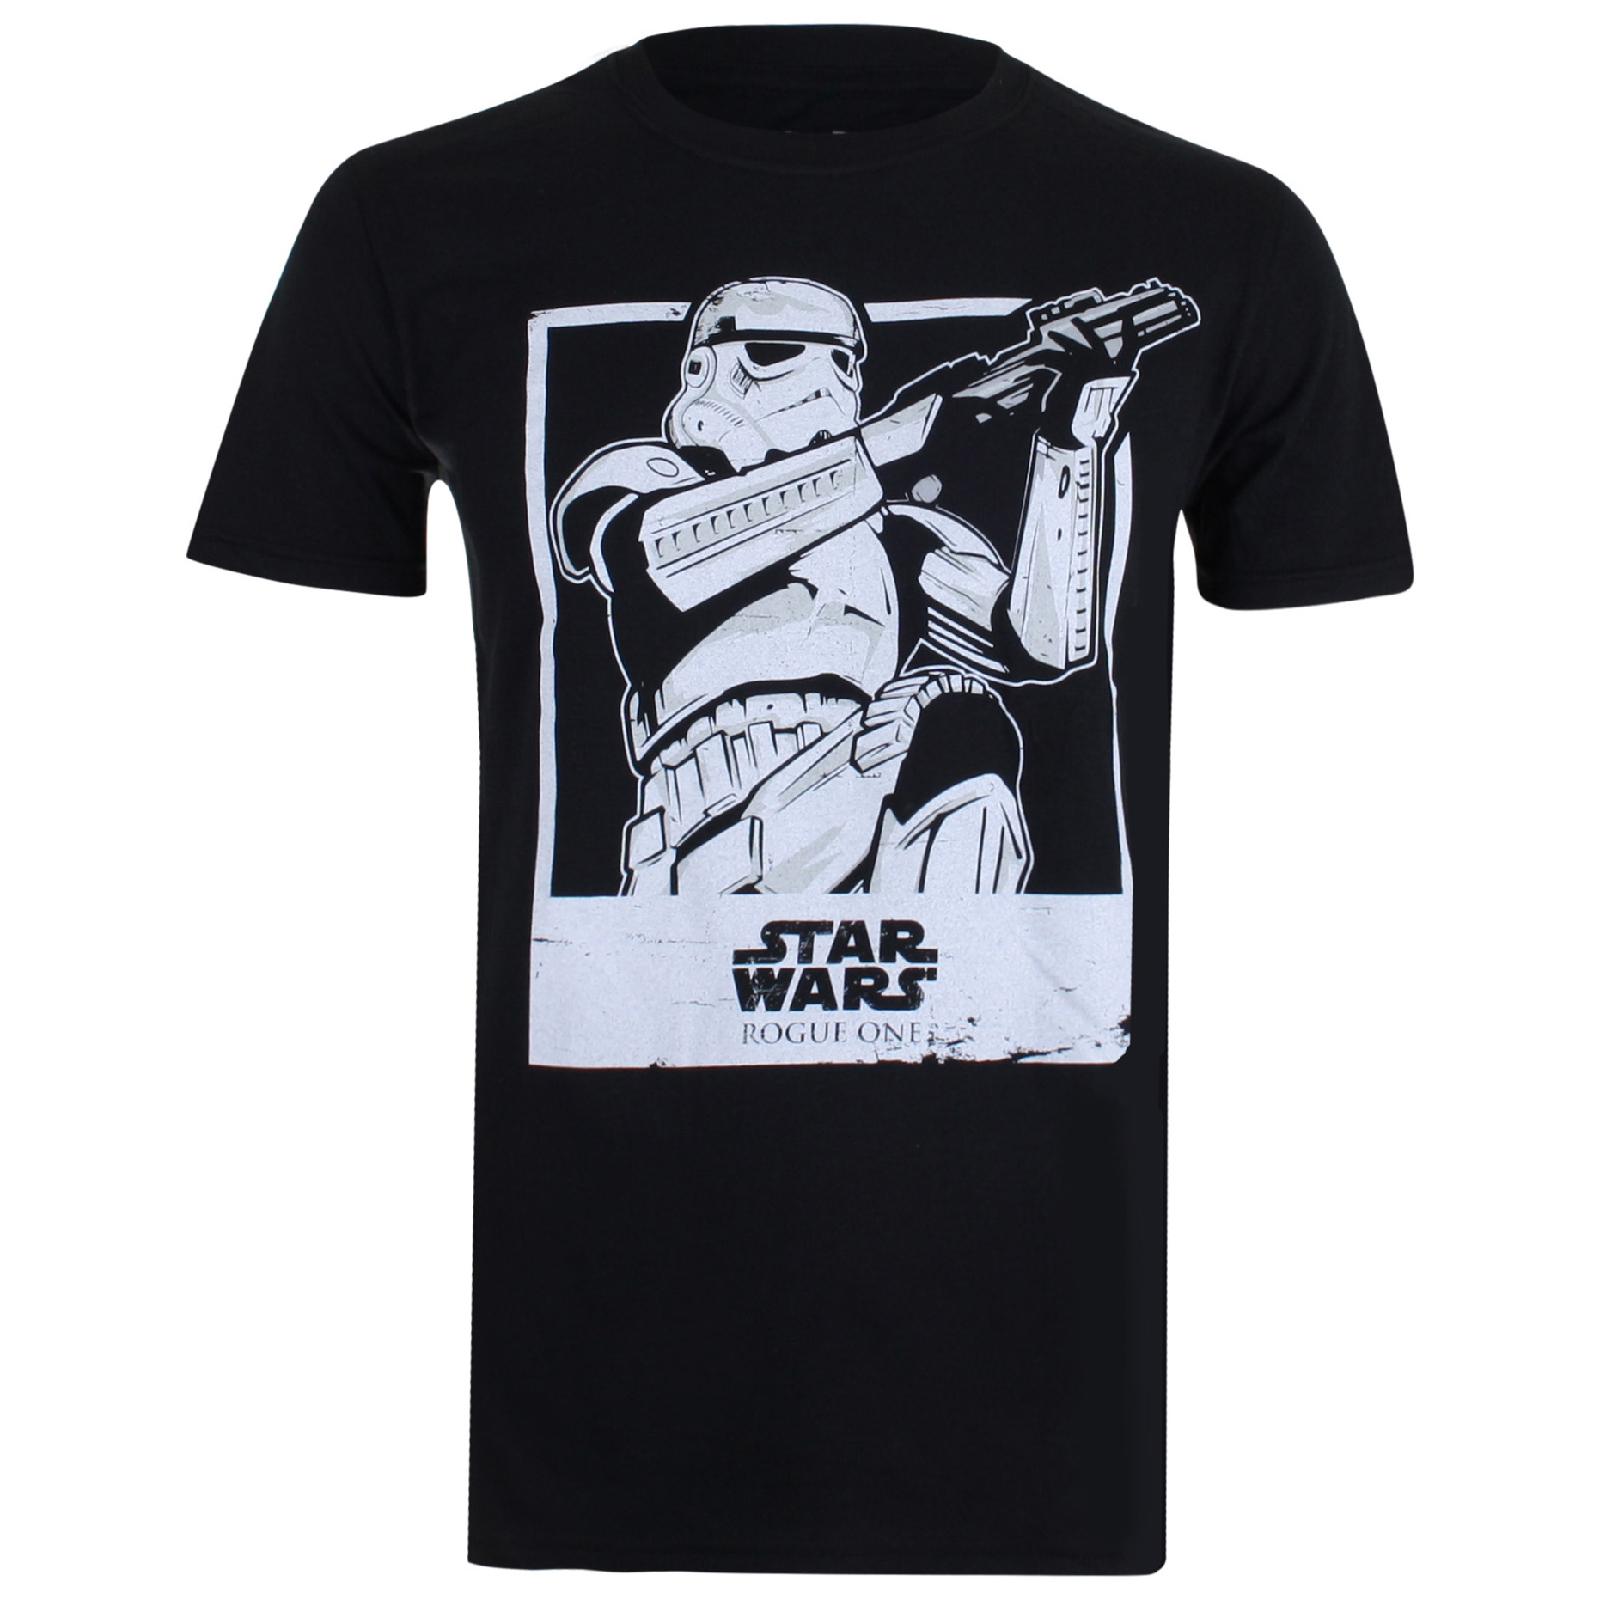 0bd335a81 Star Wars Rogue One Men's Trooper Polaroid T-Shirt - Black. Description